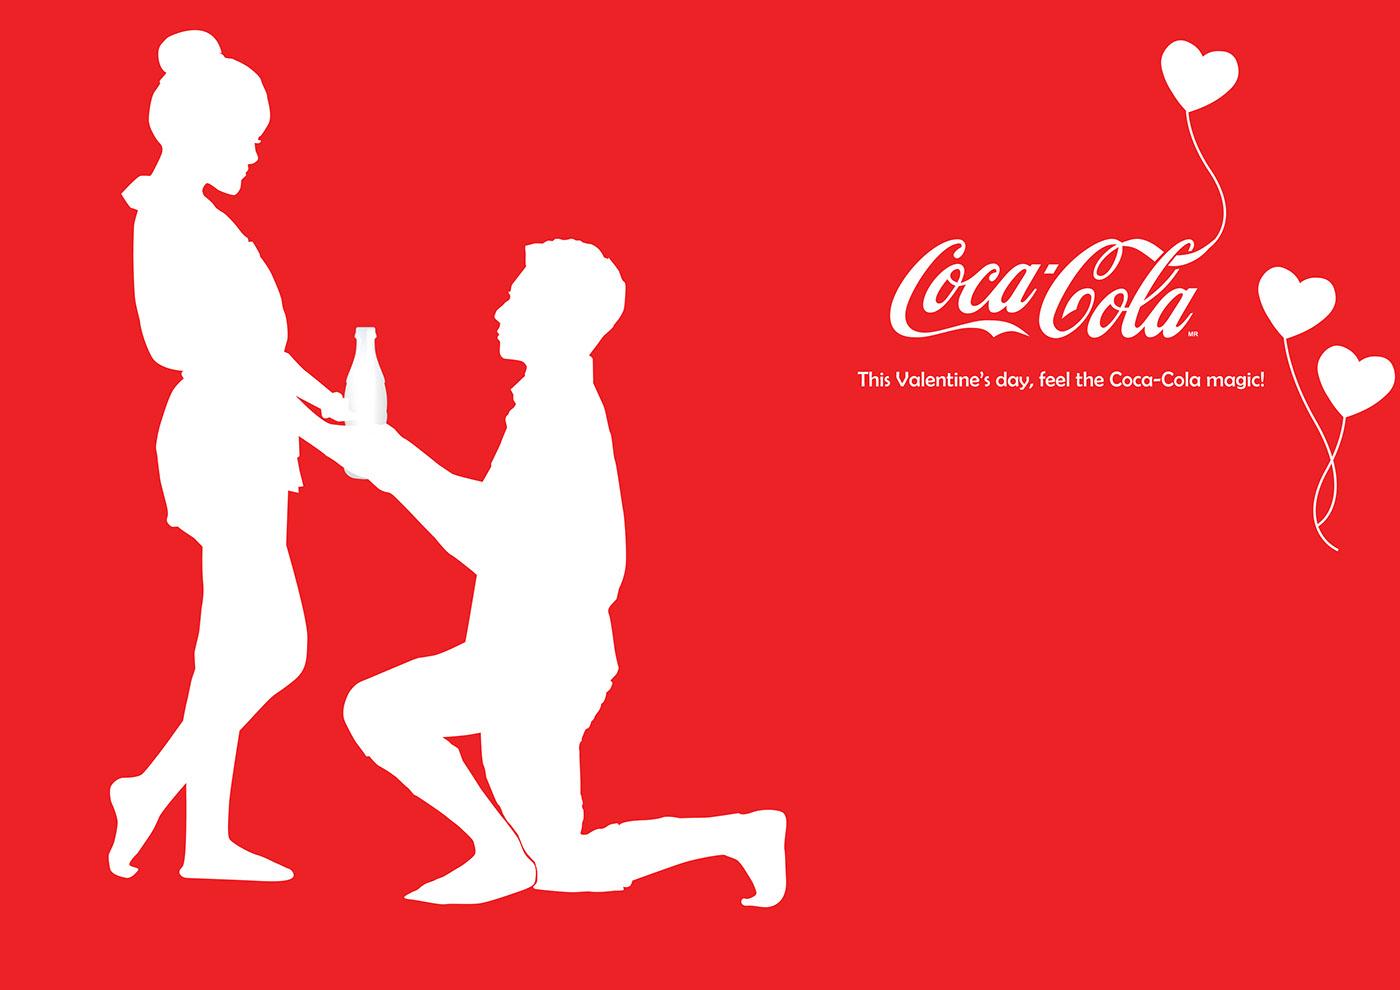 Coca Cola Print Ad on Behance